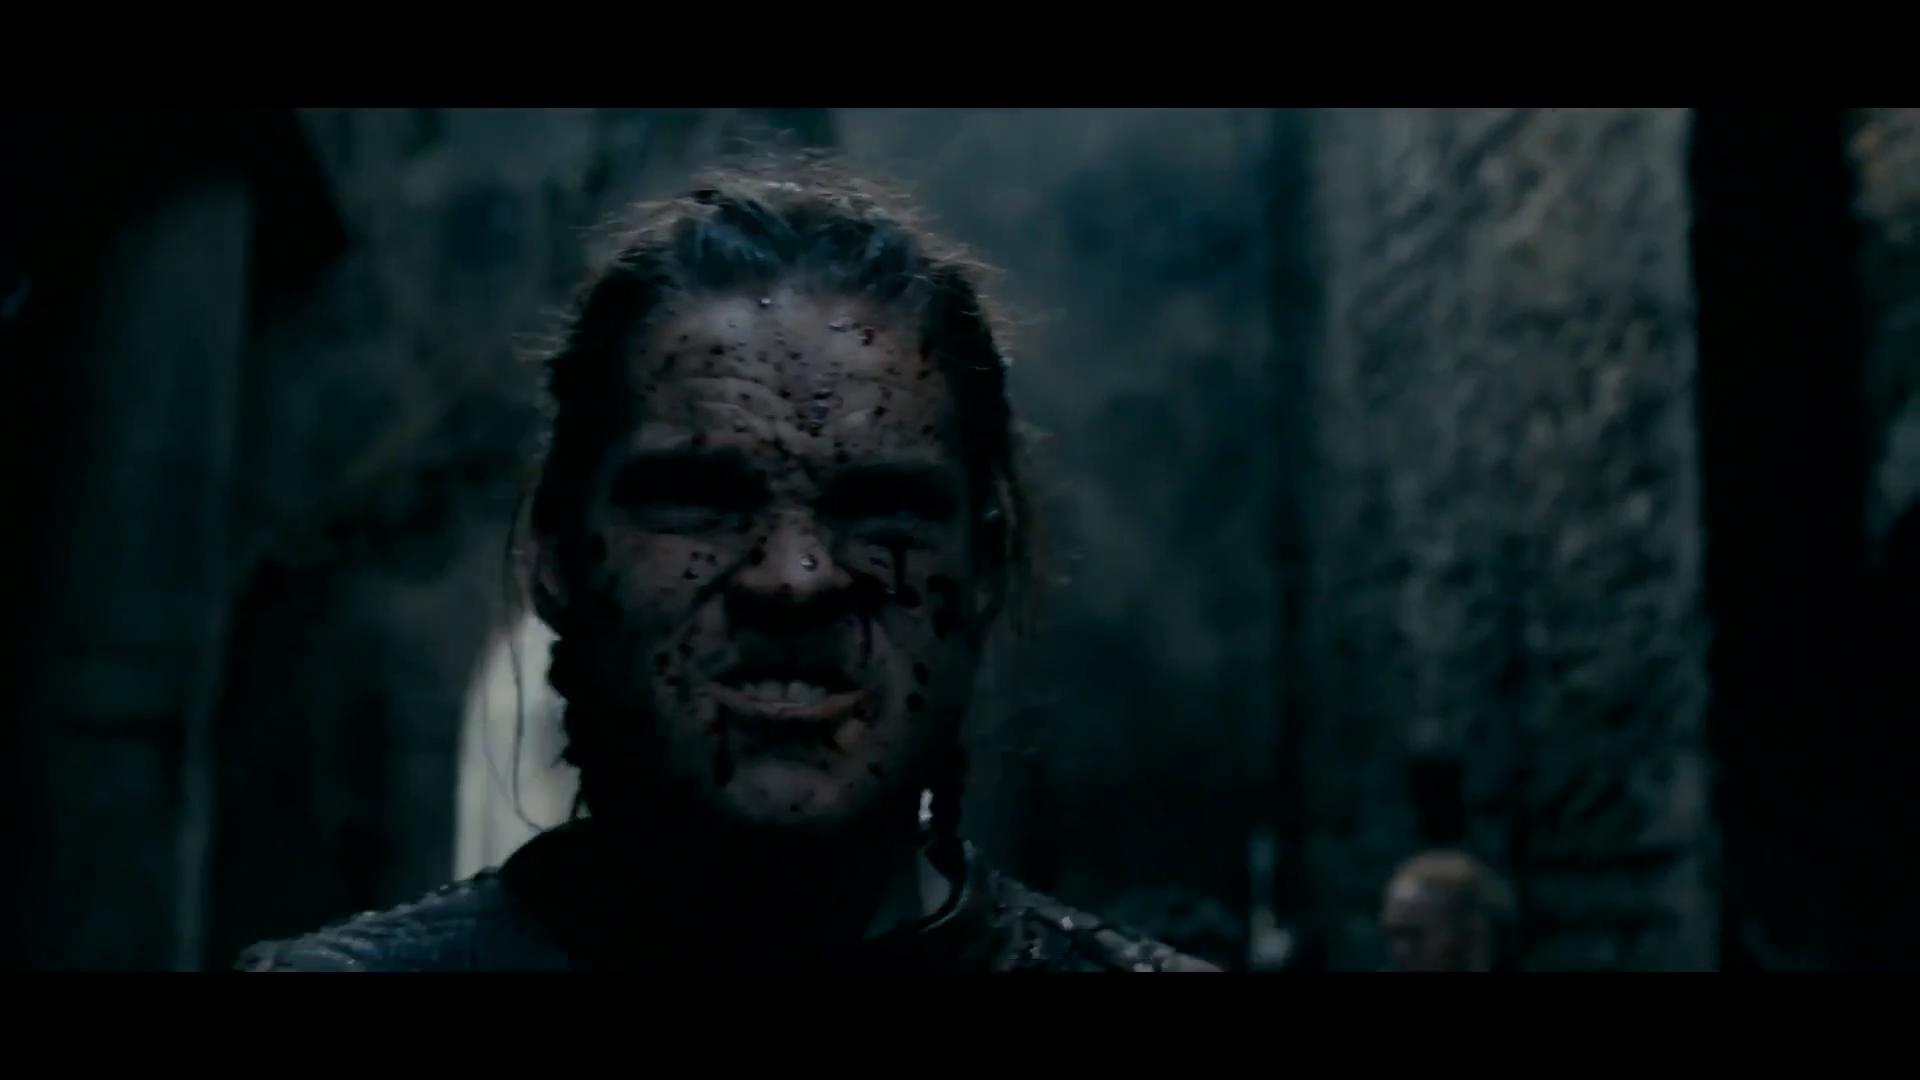 Vikings' season 5 - Hvitserk #Vikings #Hvitserk | TV ⚔ Vikings